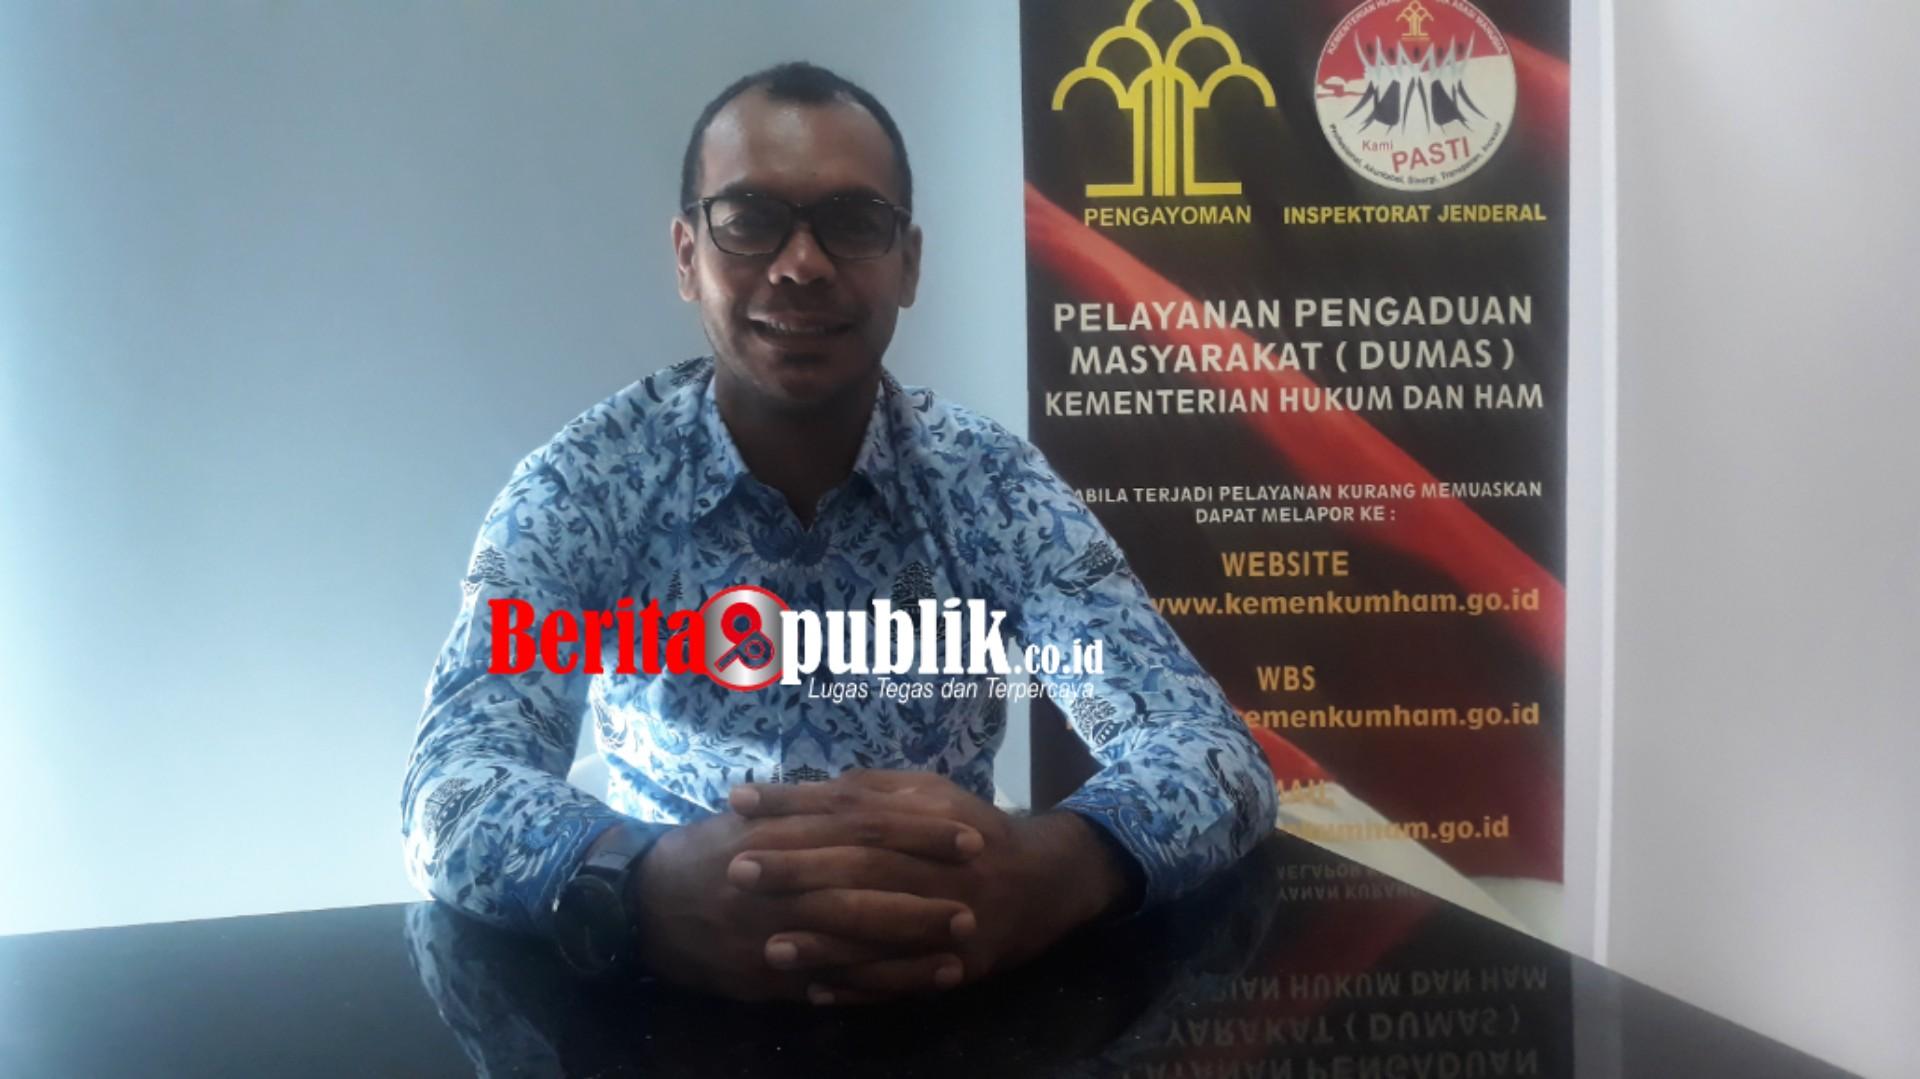 Kepala Imigrasi Kelas II Non TPI Bekasi, Petrus Teguh